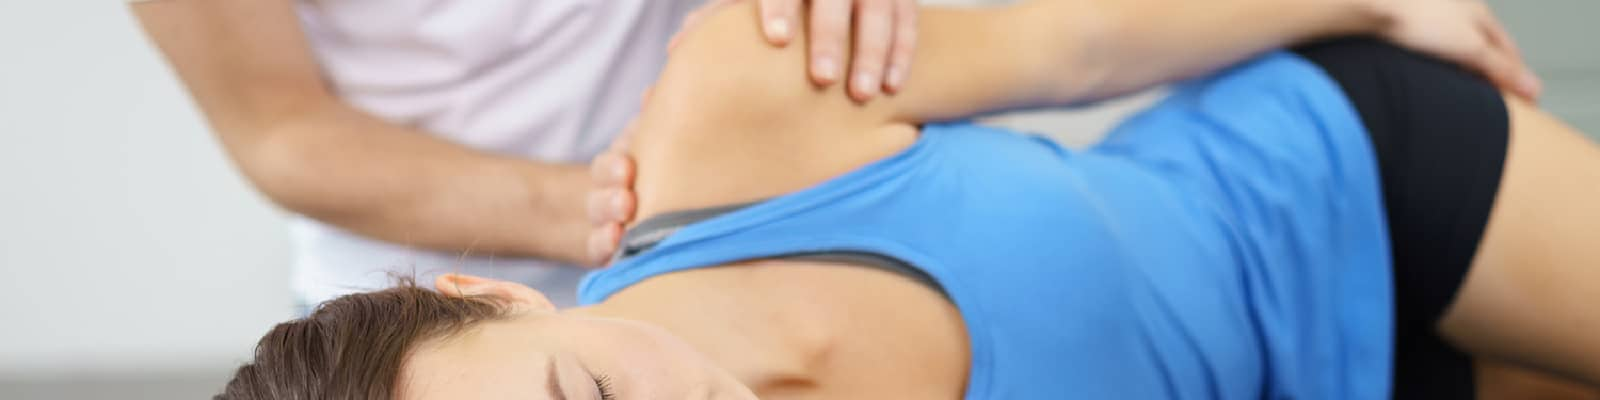 Impingement subacromial o sindrome de impactación